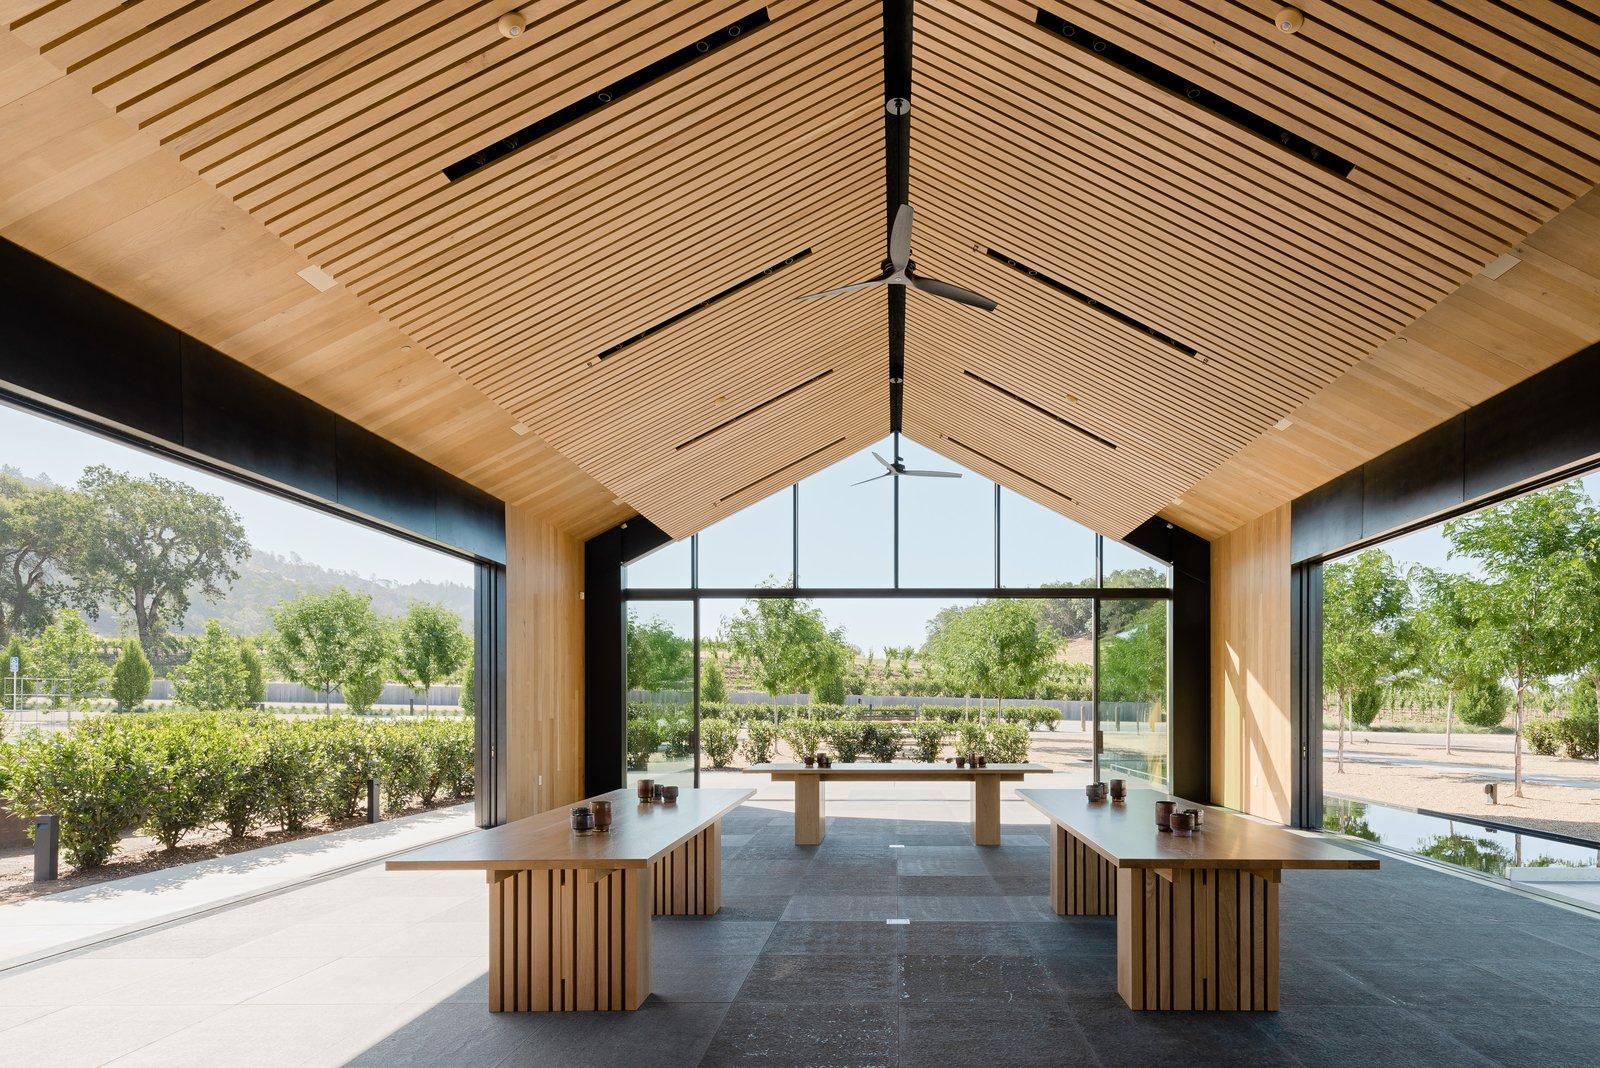 Silver Oak winery tasting room interior